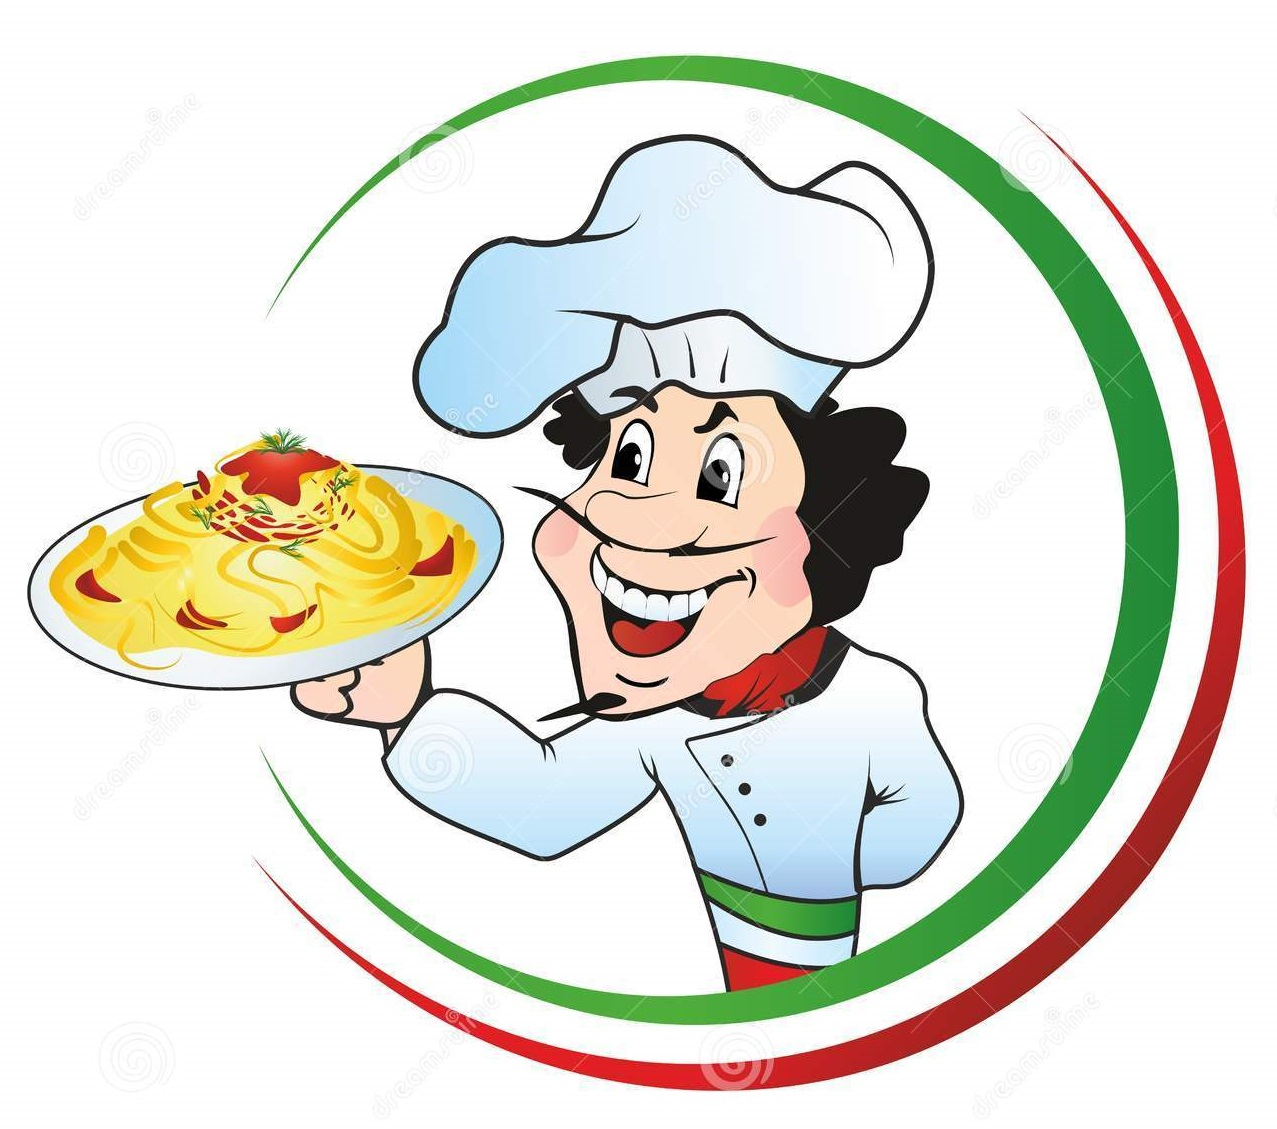 chef-plate-spaghetti-italian-holding-36164383